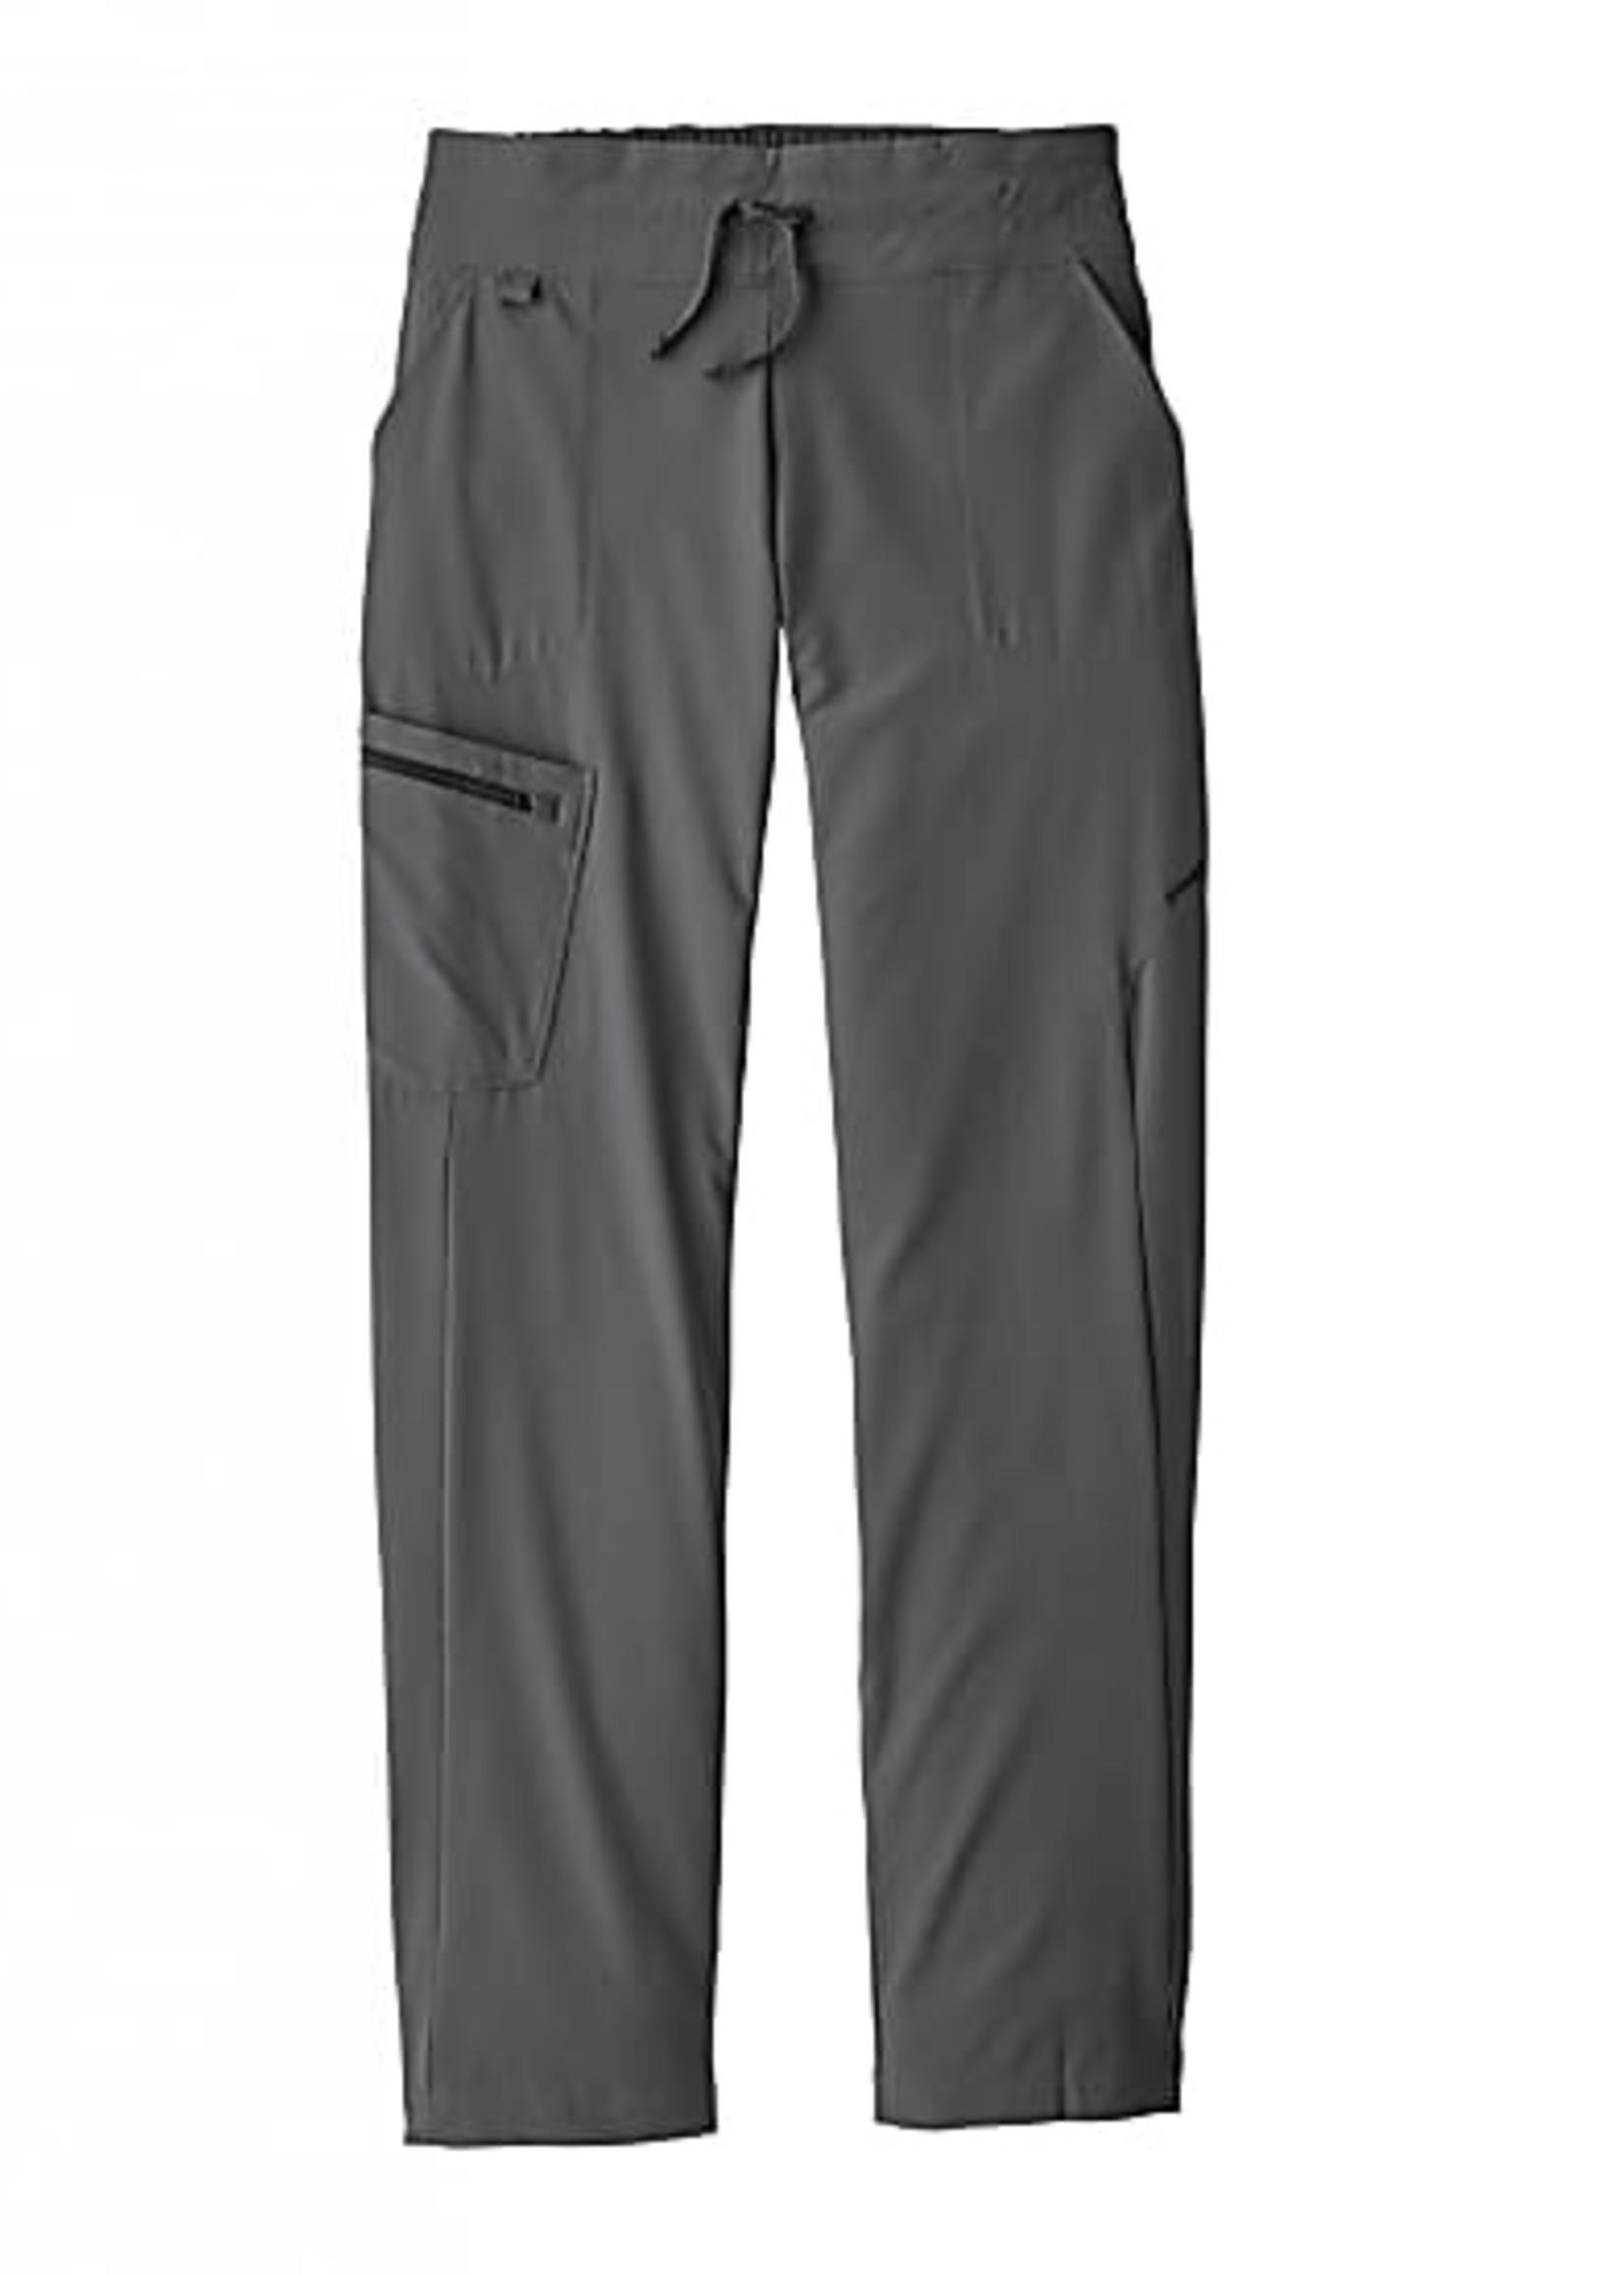 PATAGONIA Women's Fall River Comfort Stretch Pants